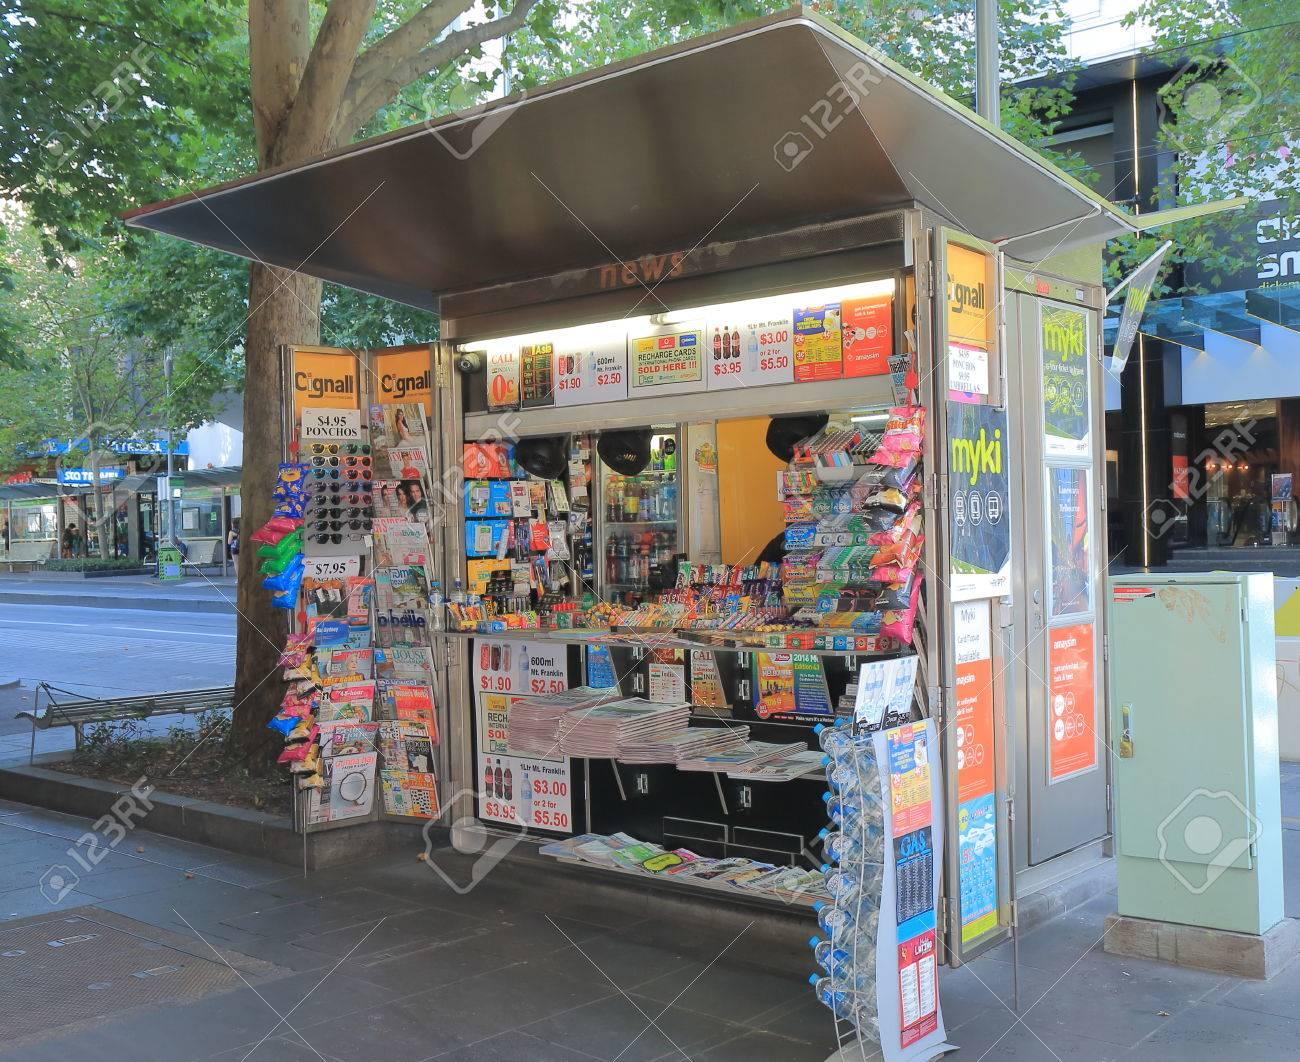 Melbourne Australia - February 13, 2016: News agency kiosk in downtown Melbourne. - 53489796